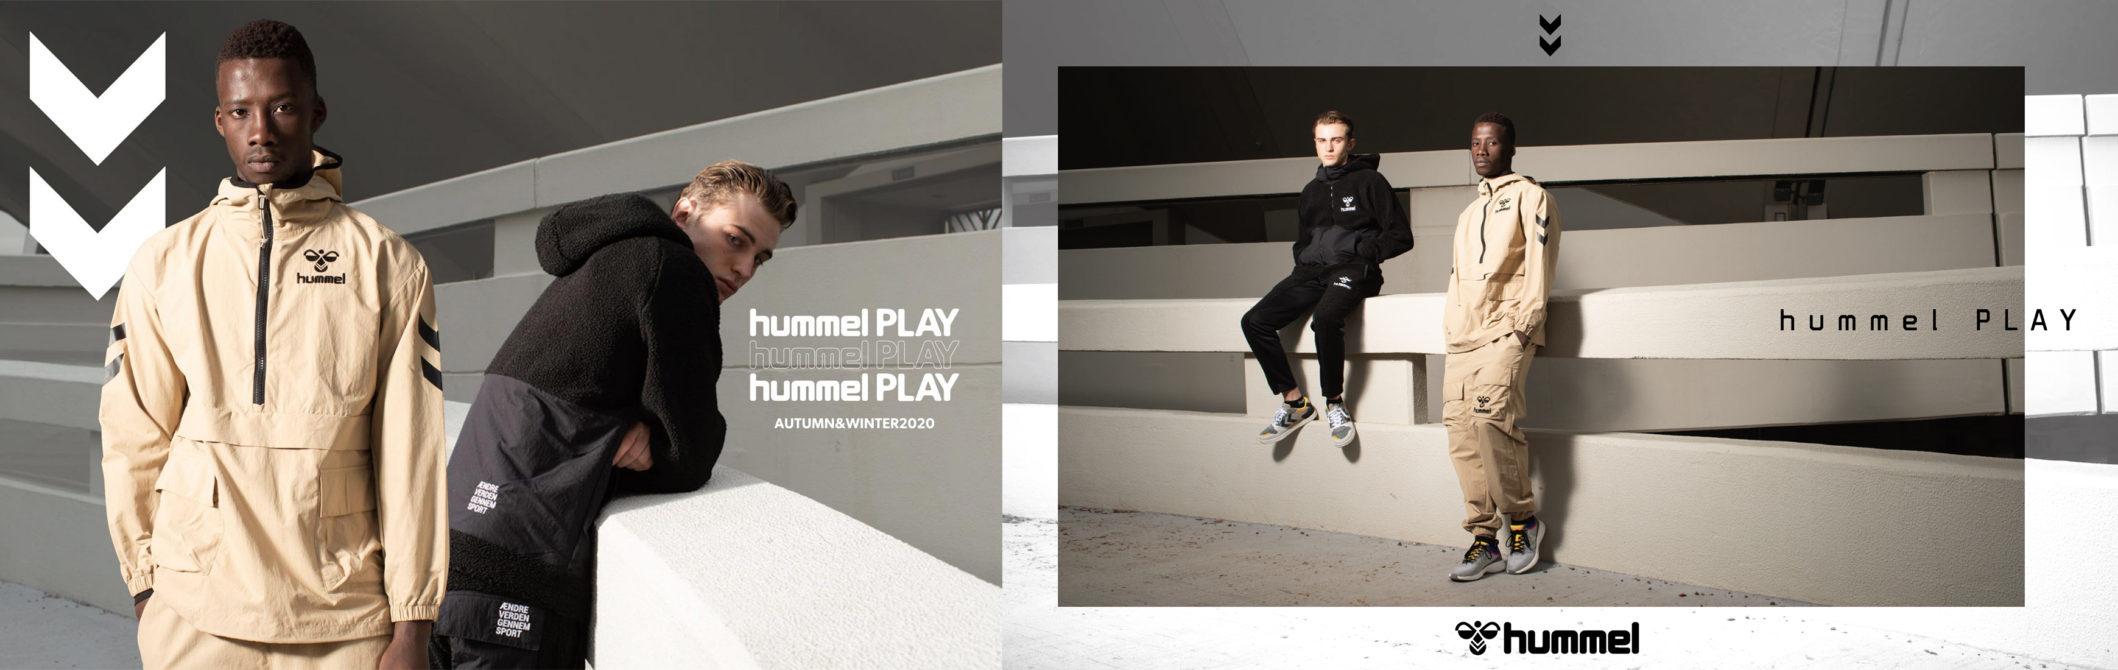 hummel PLAY_2020AW